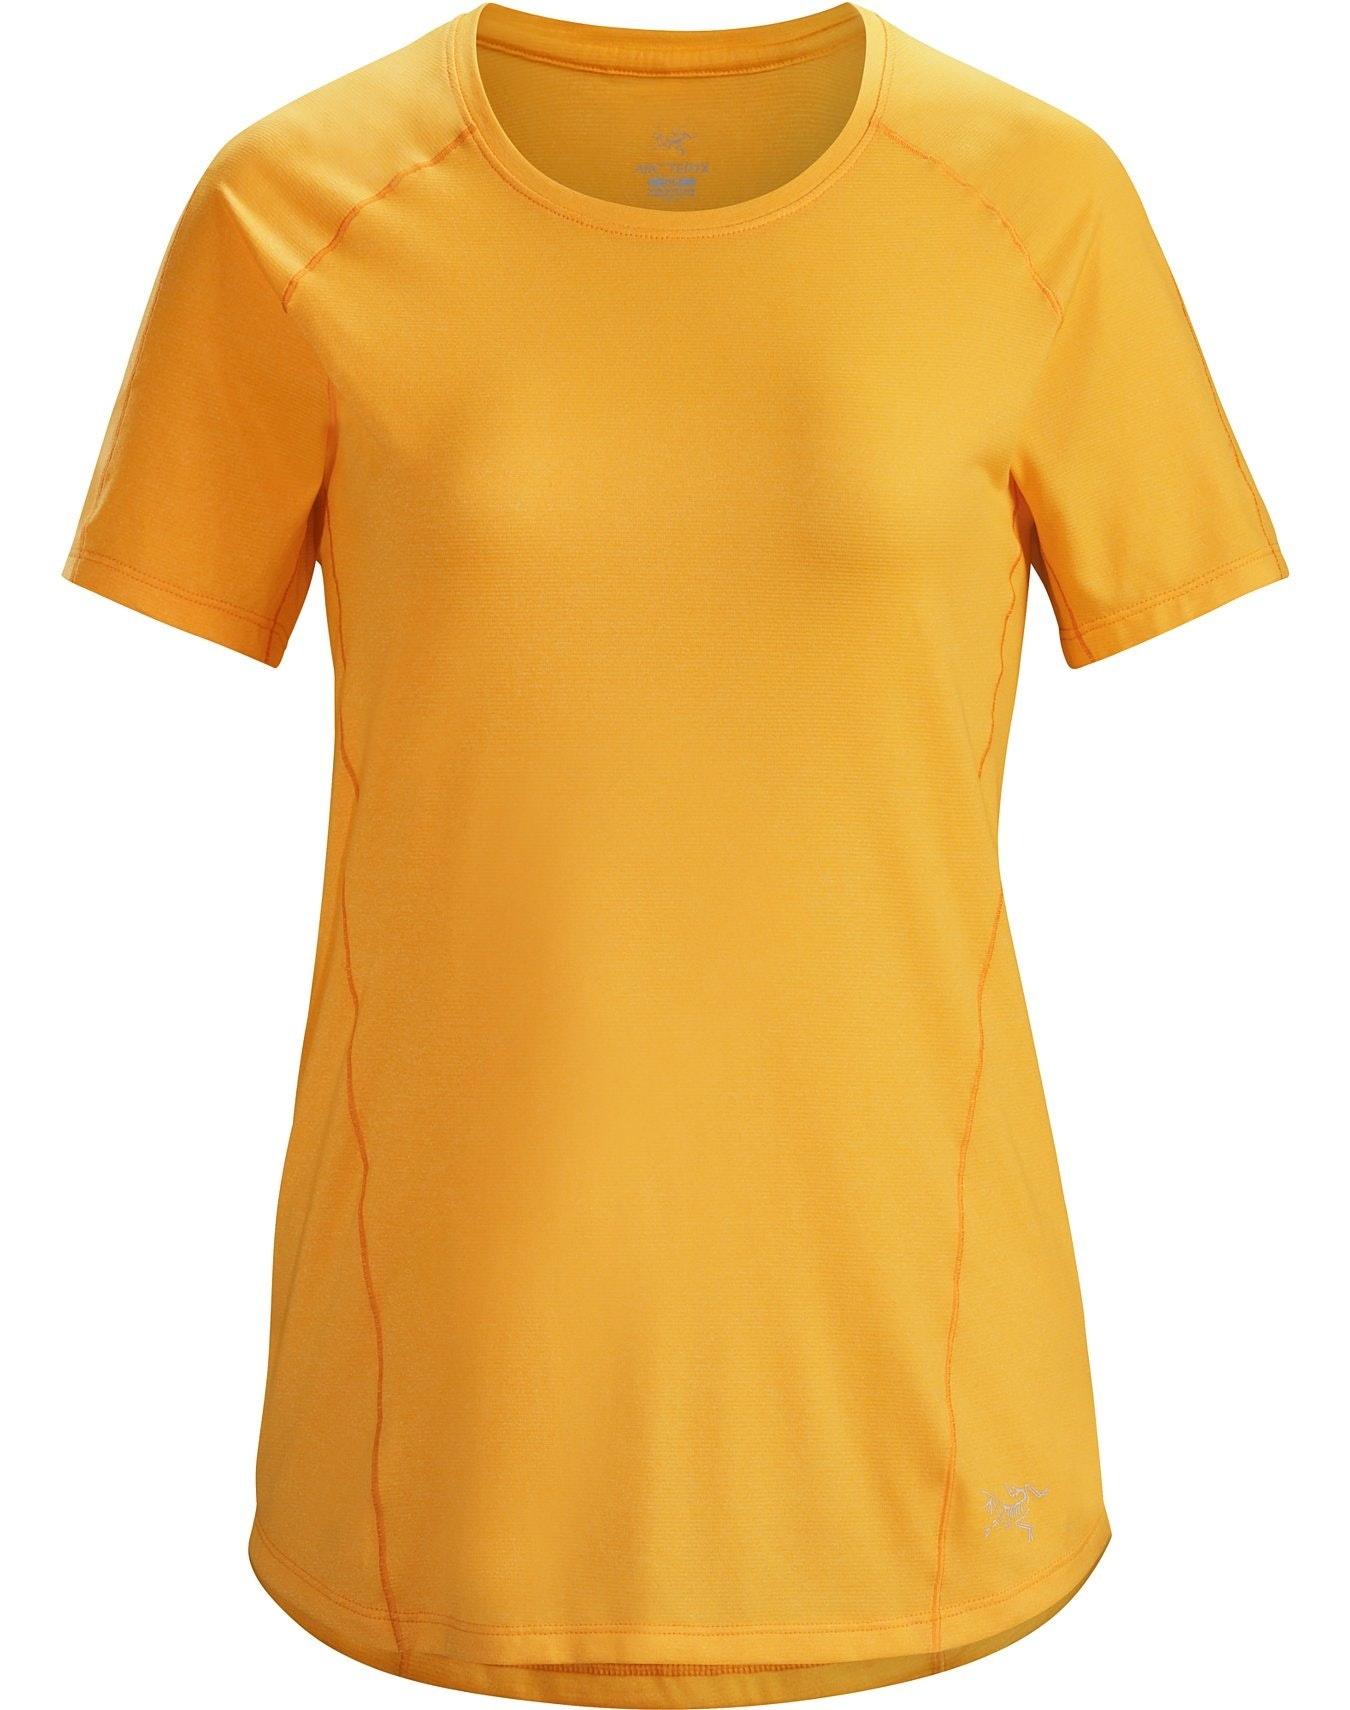 Arcteryx Women's Tolu Top Short Sleeve